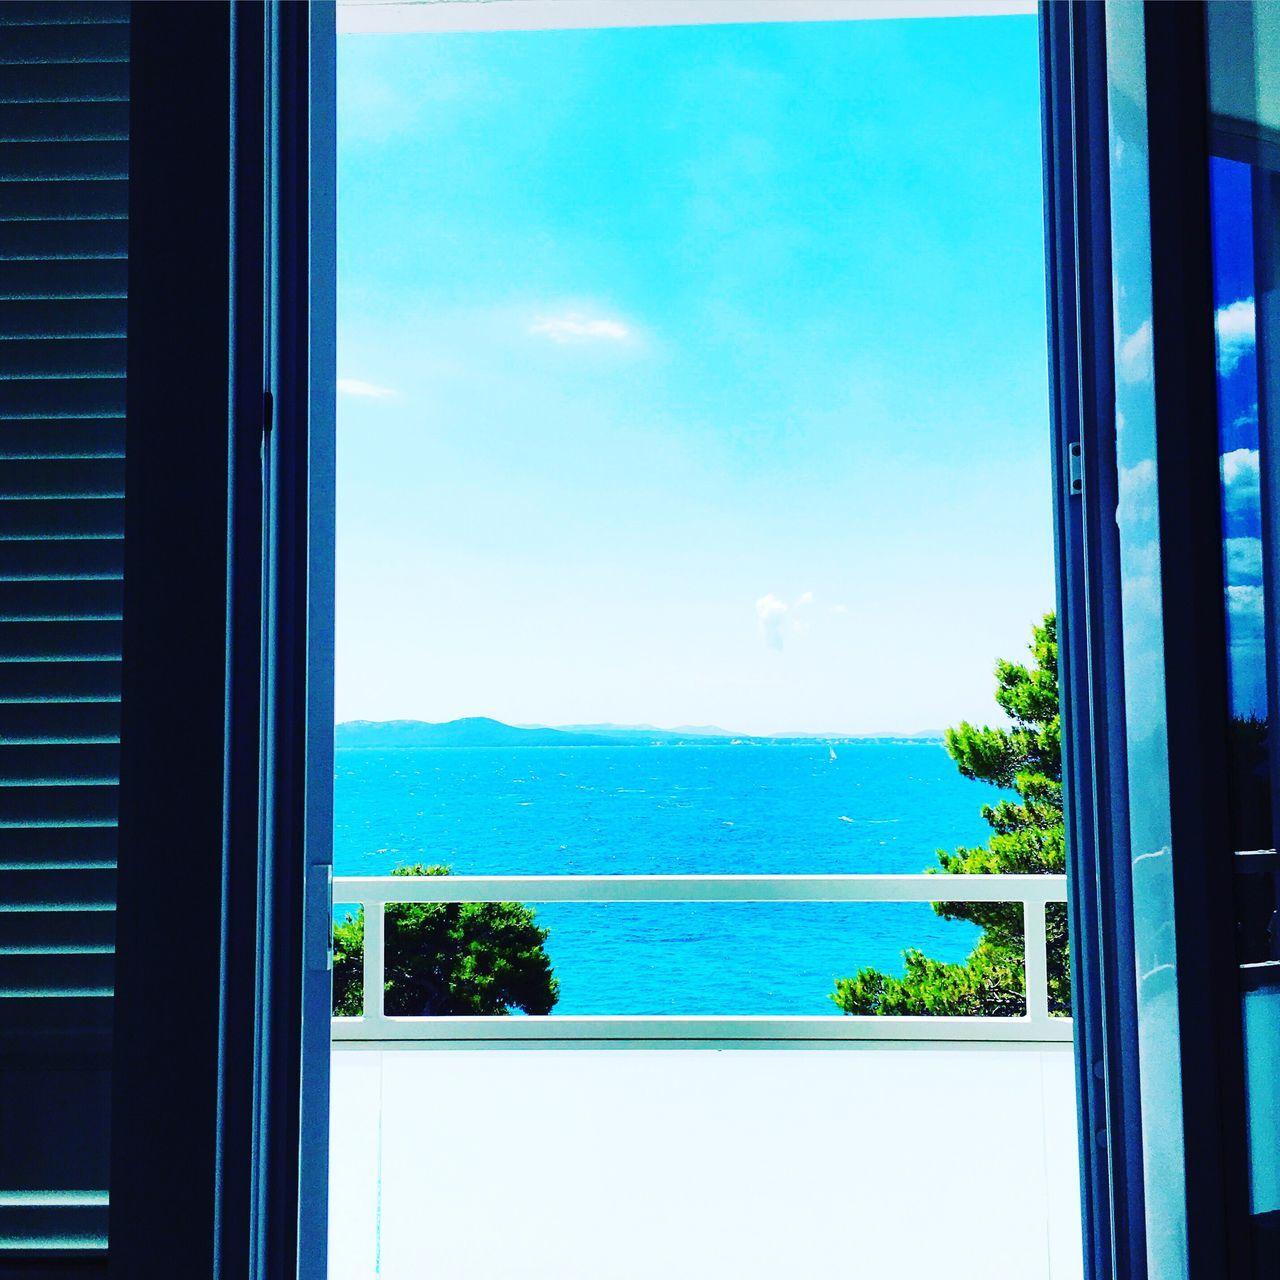 Room with view Blue Sky Croatia Petrcane Hotel Room